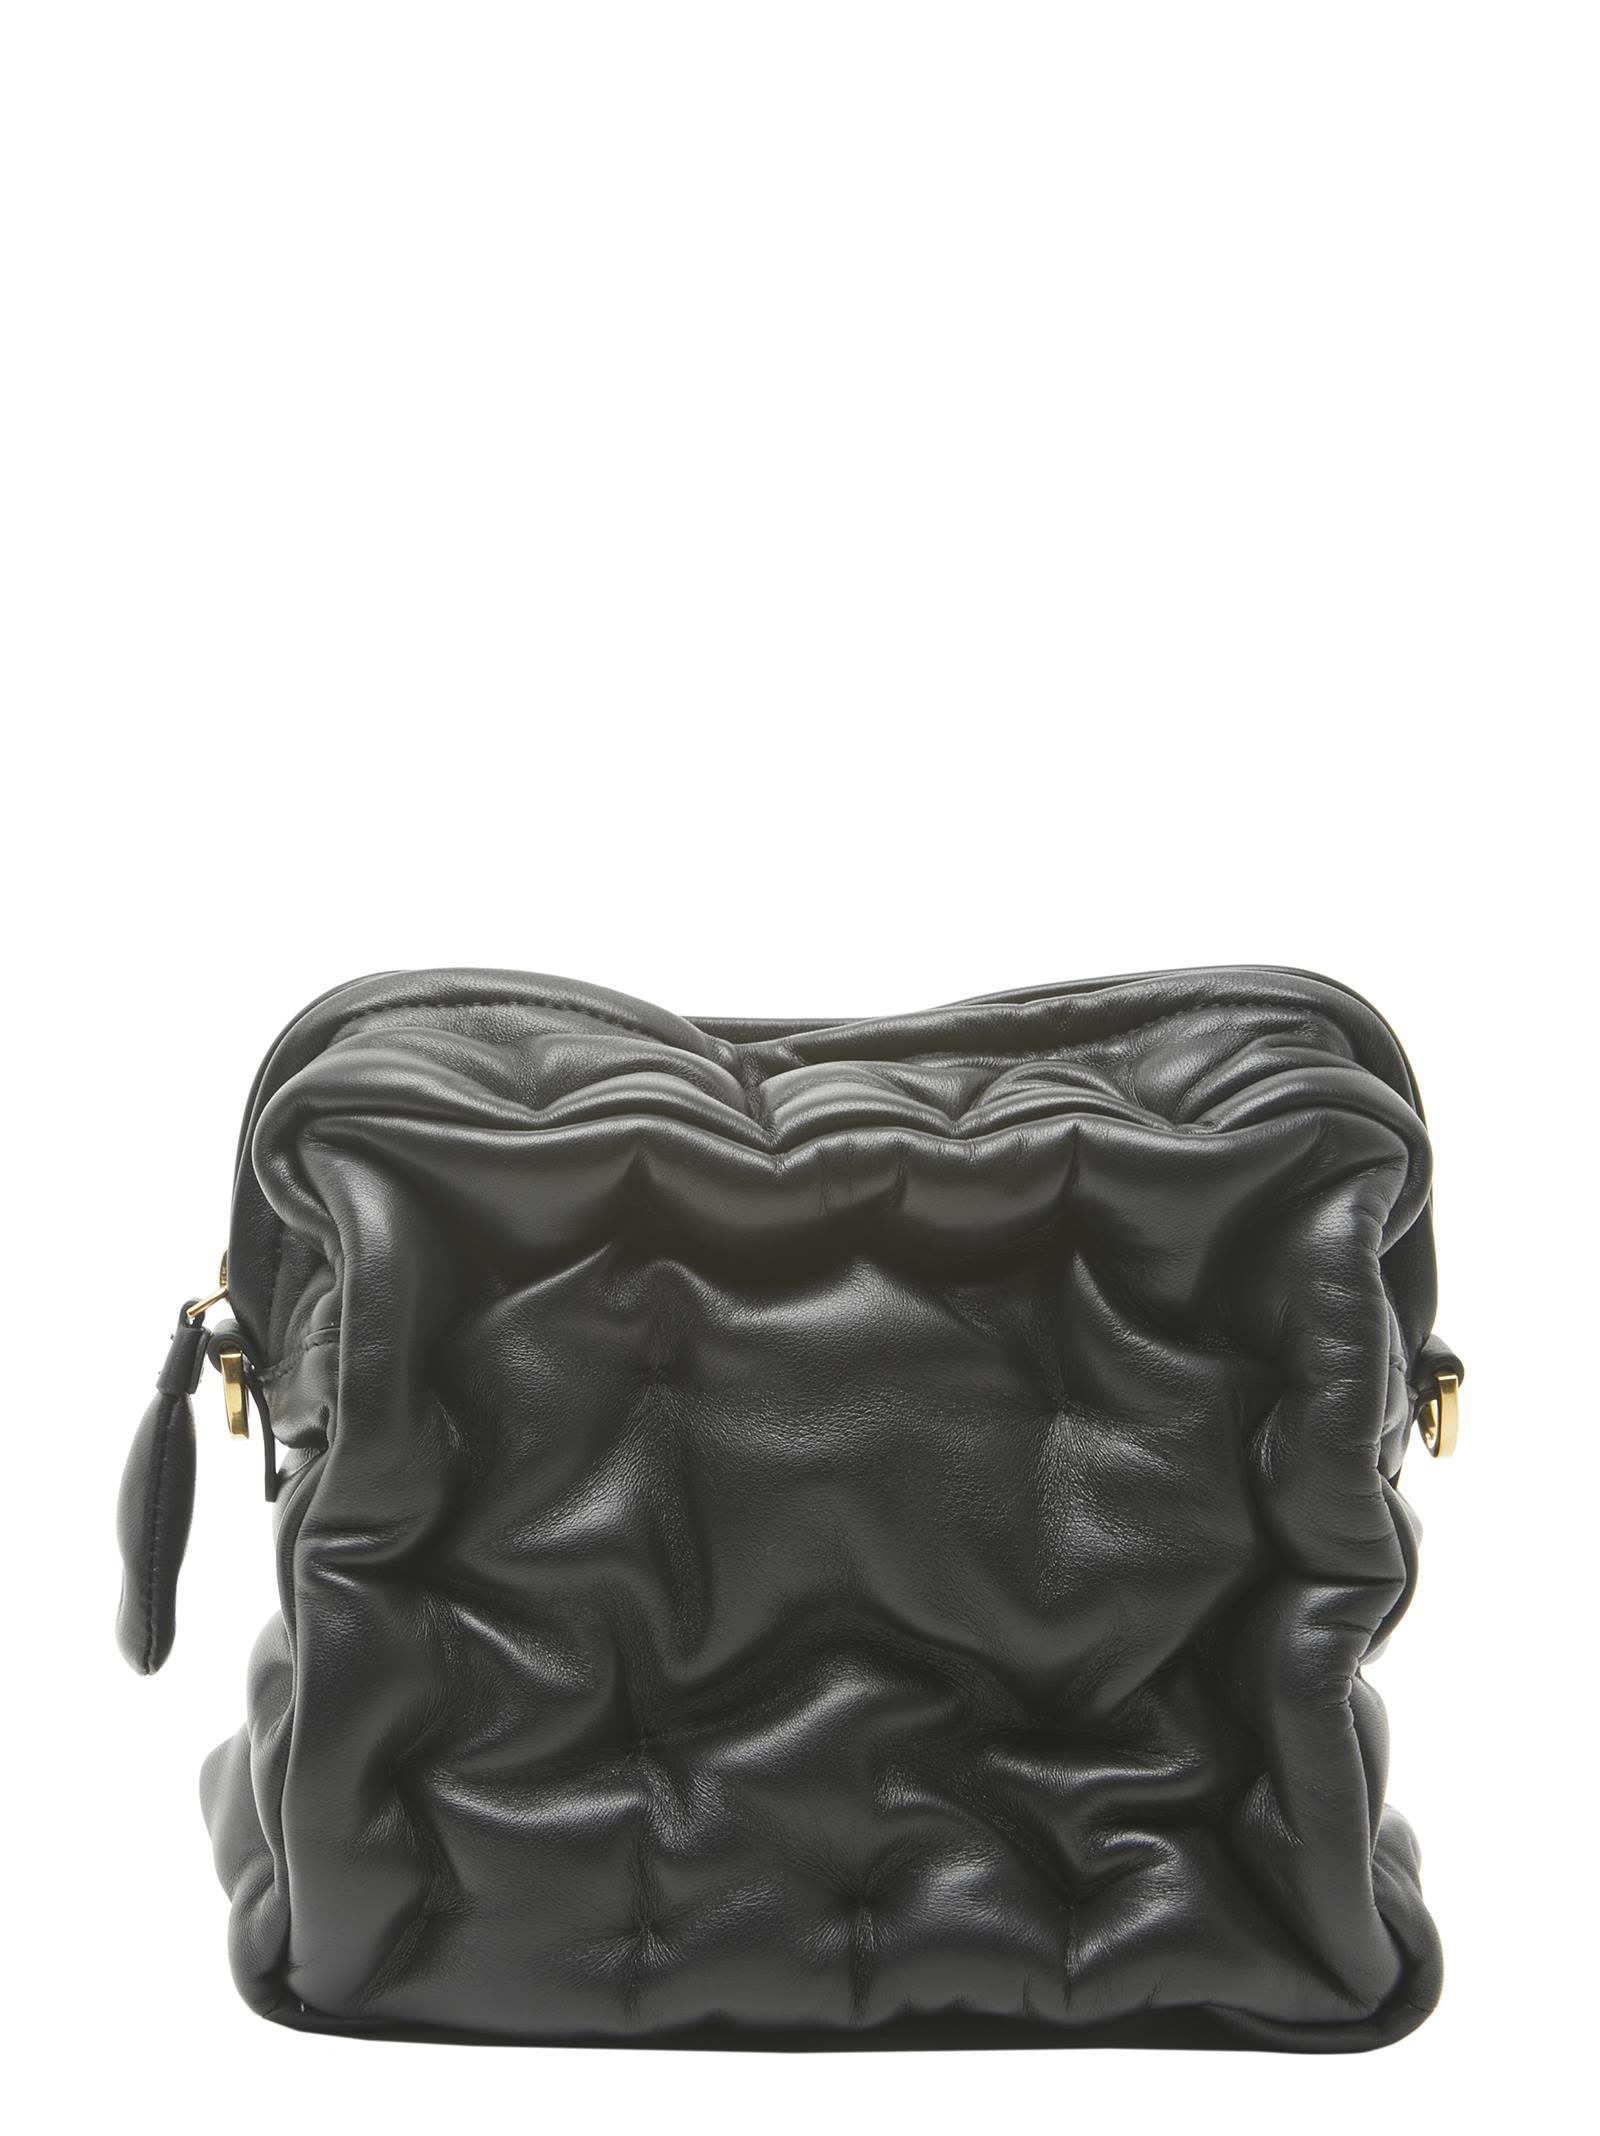 651ecb843 ANYA HINDMARCH CHUBBY CUBE BAG, BLACK | ModeSens